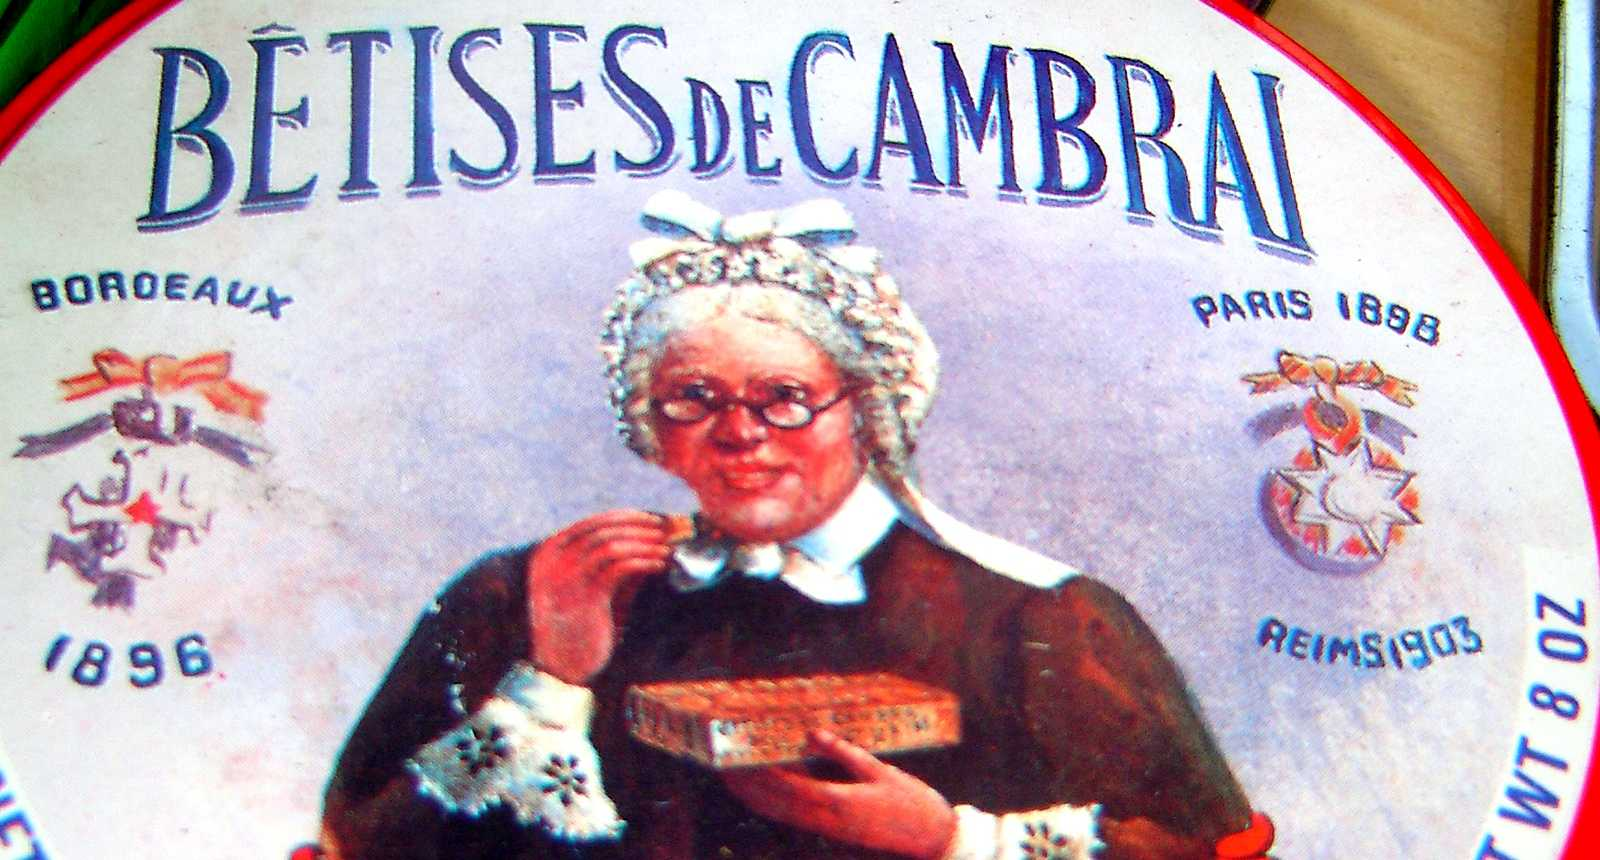 Les Bêtises de Cambrai